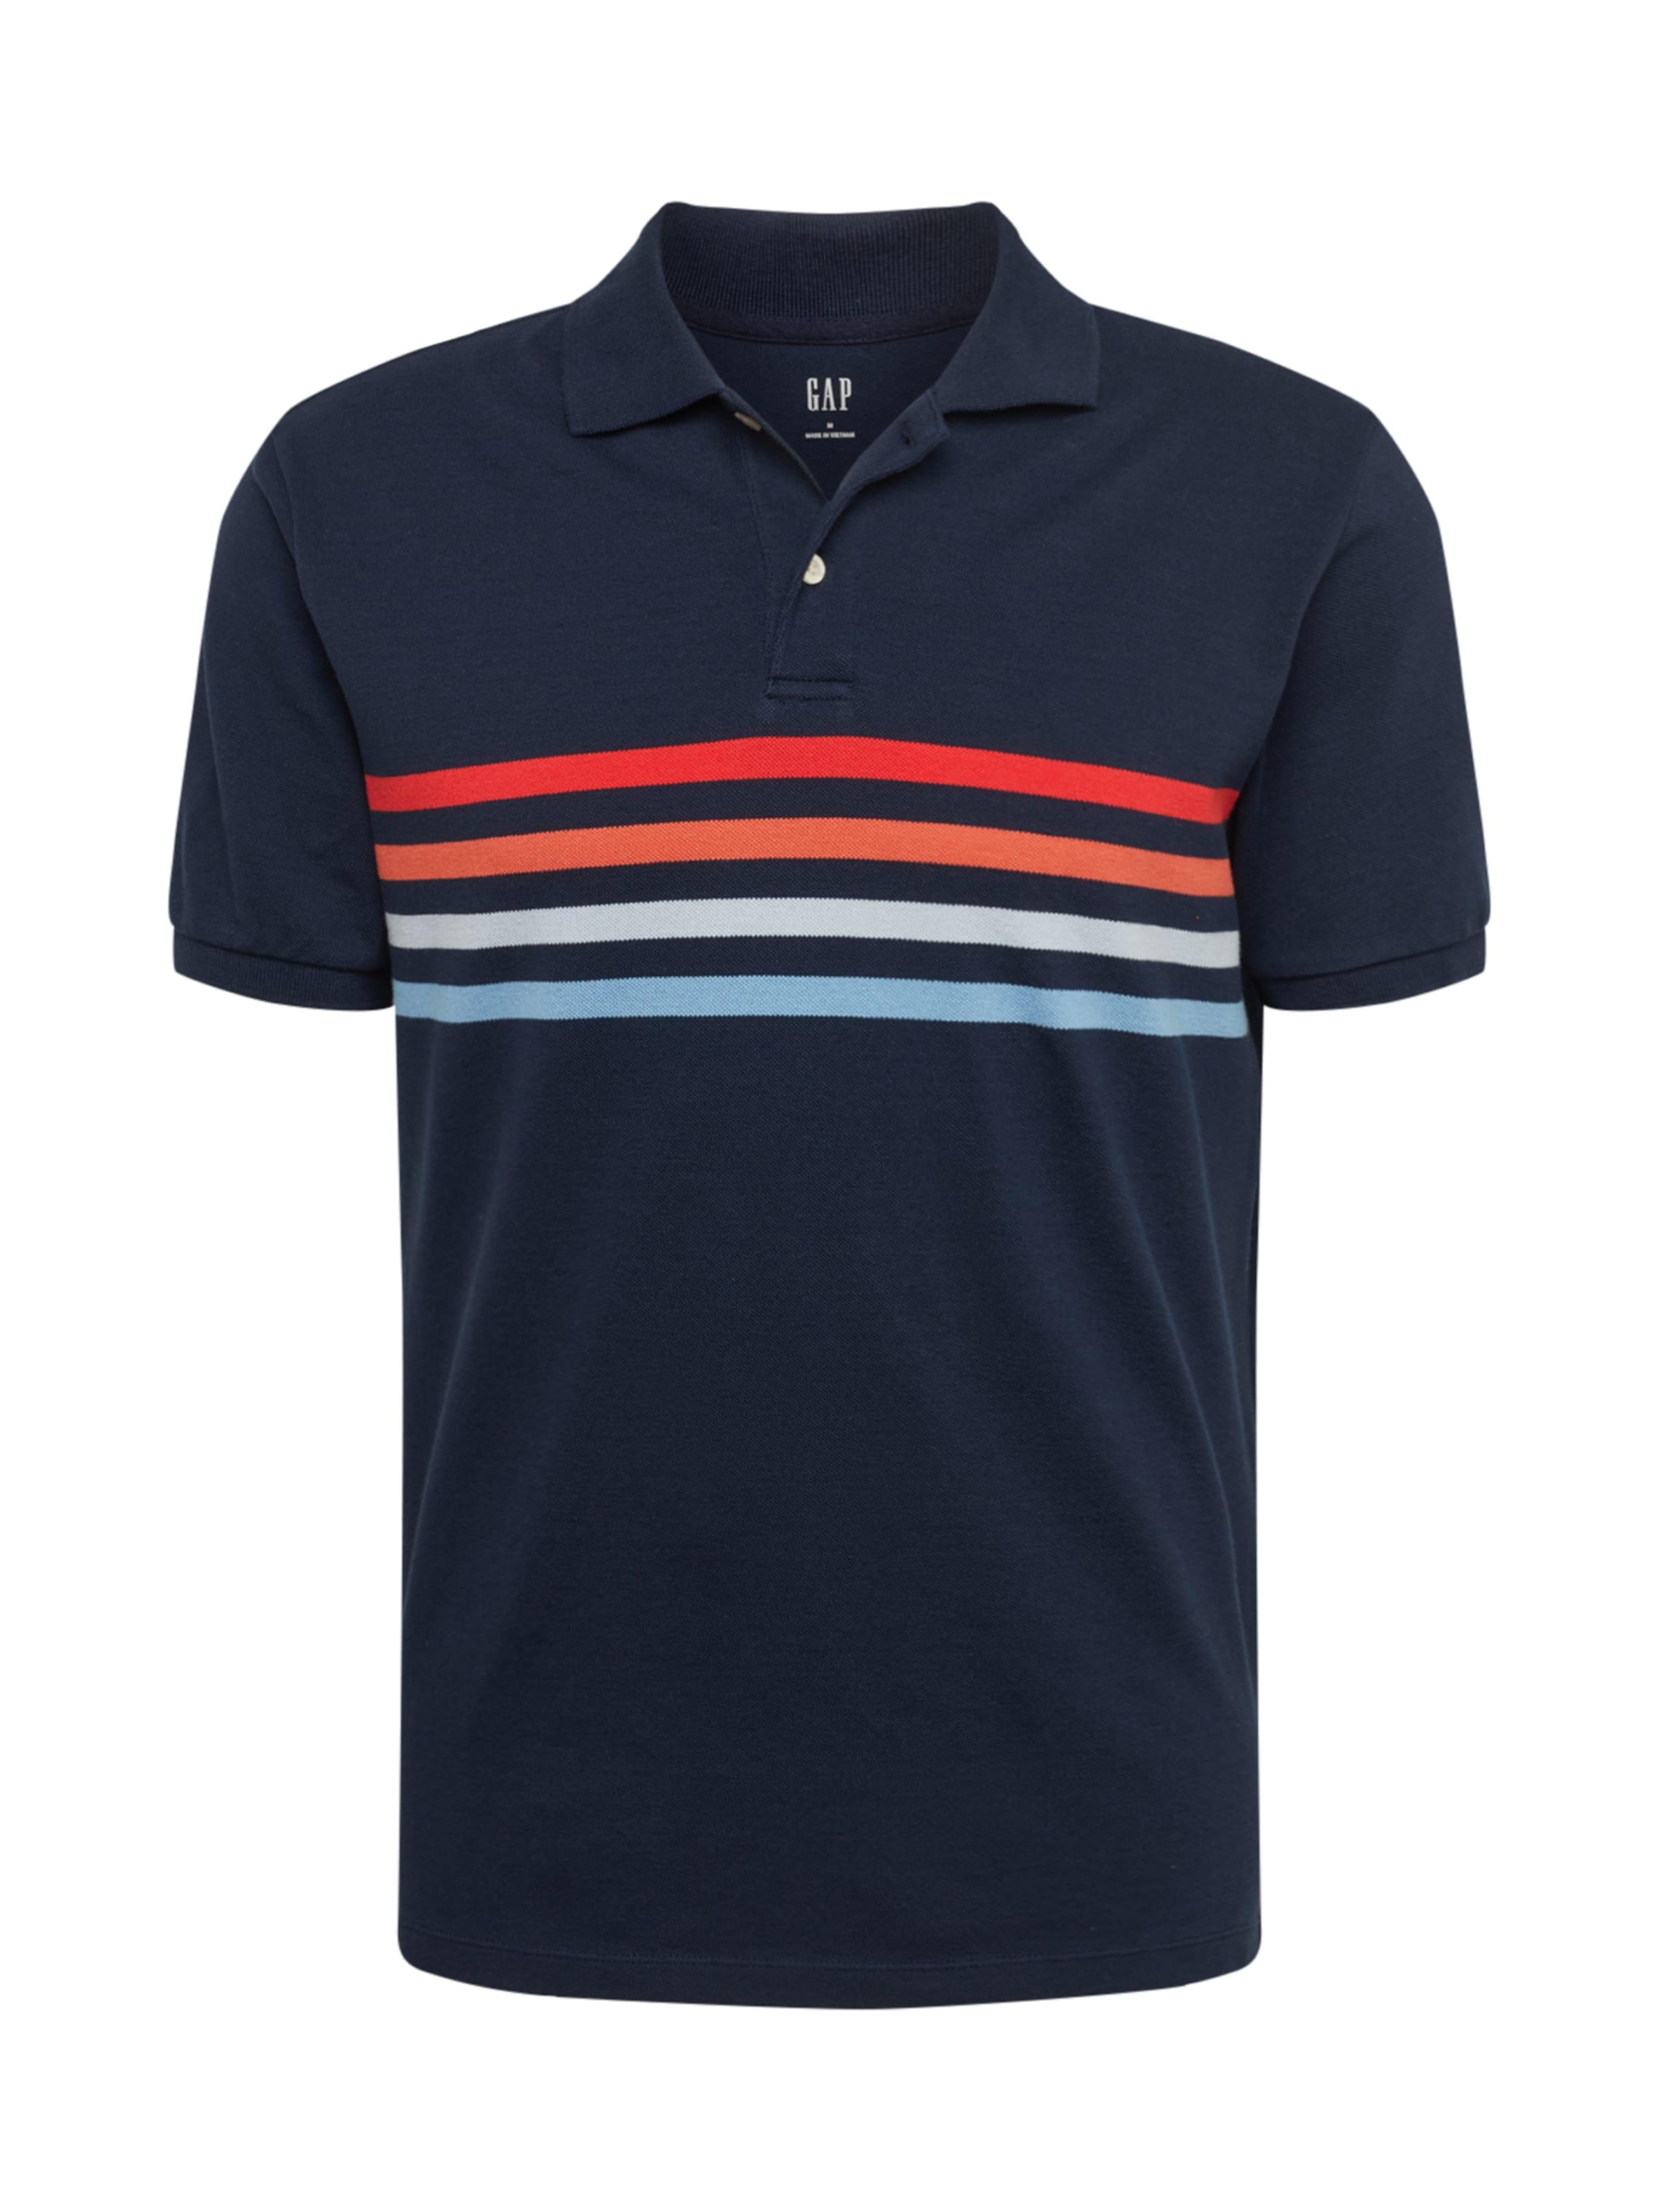 Blau 'pk Polo In Gap Stripe' wNm8nv0